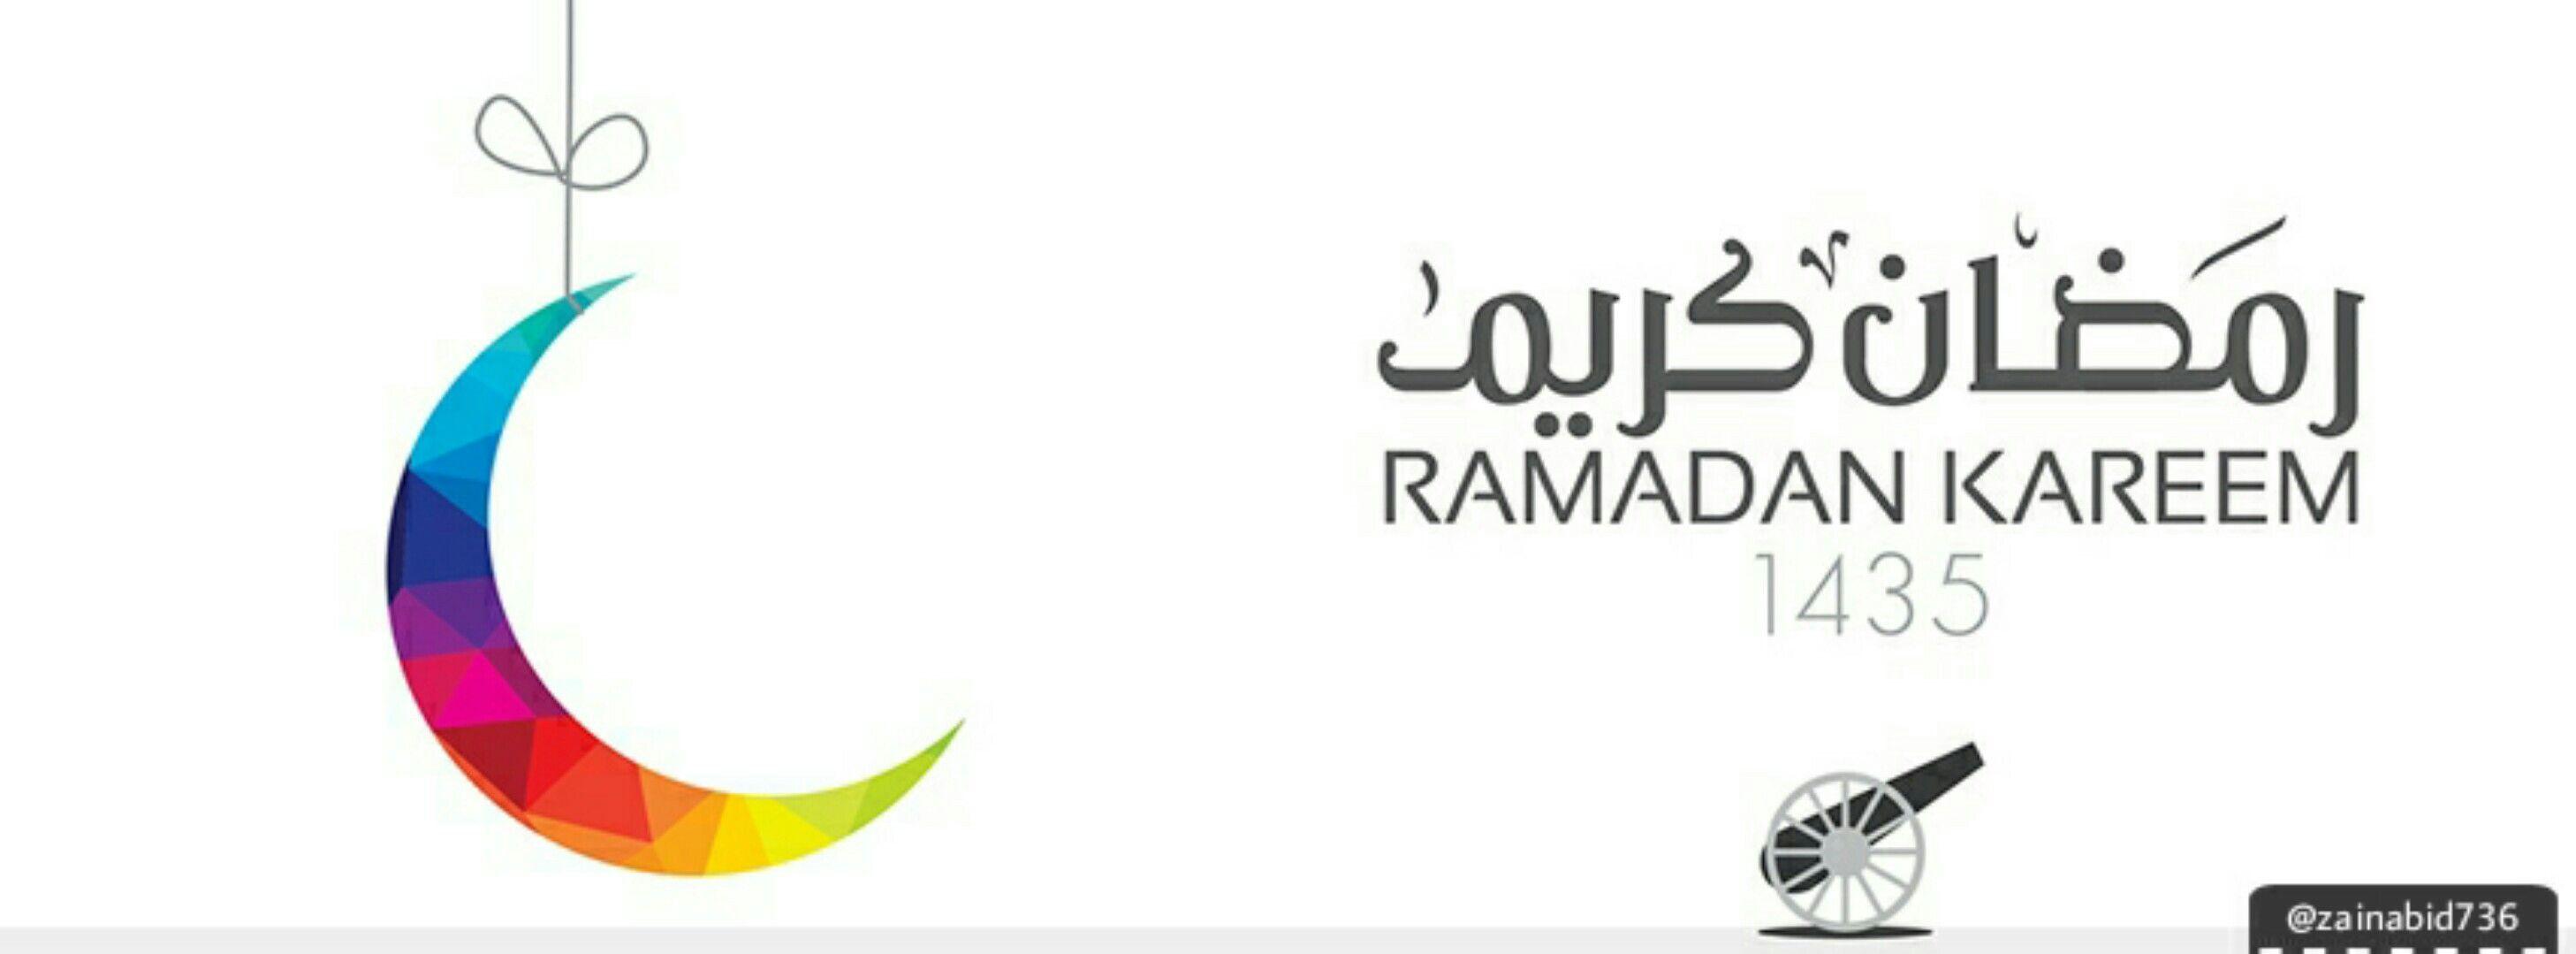 Ramadan 2k17 Ramadankareem Ramadanmubarak Ramadan Kareem Ramadan Facebook Cover